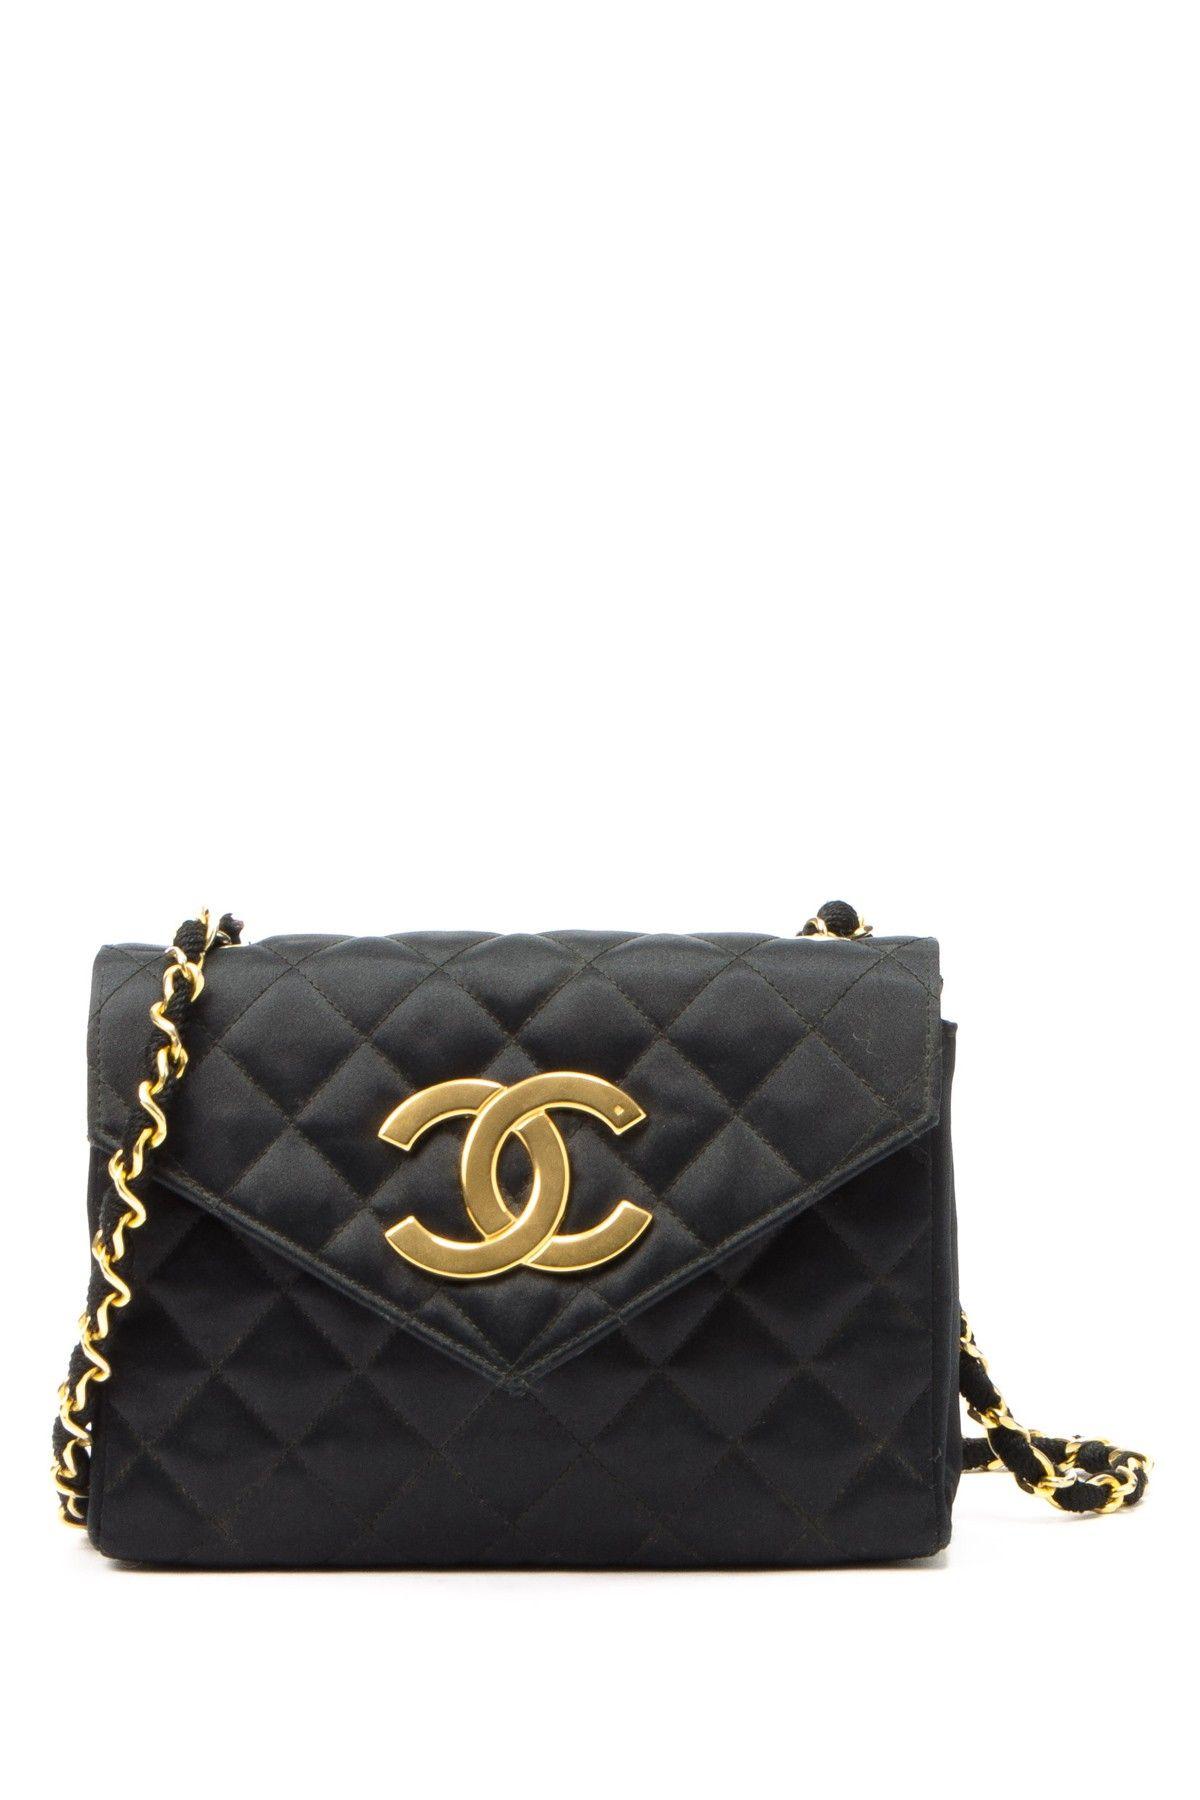 Vintage Chanel Satin Matlasse Chain Shoulder Bag Sac Chanel Cru,  Porte-monnaie Chanel, 3aa3bf16f9a